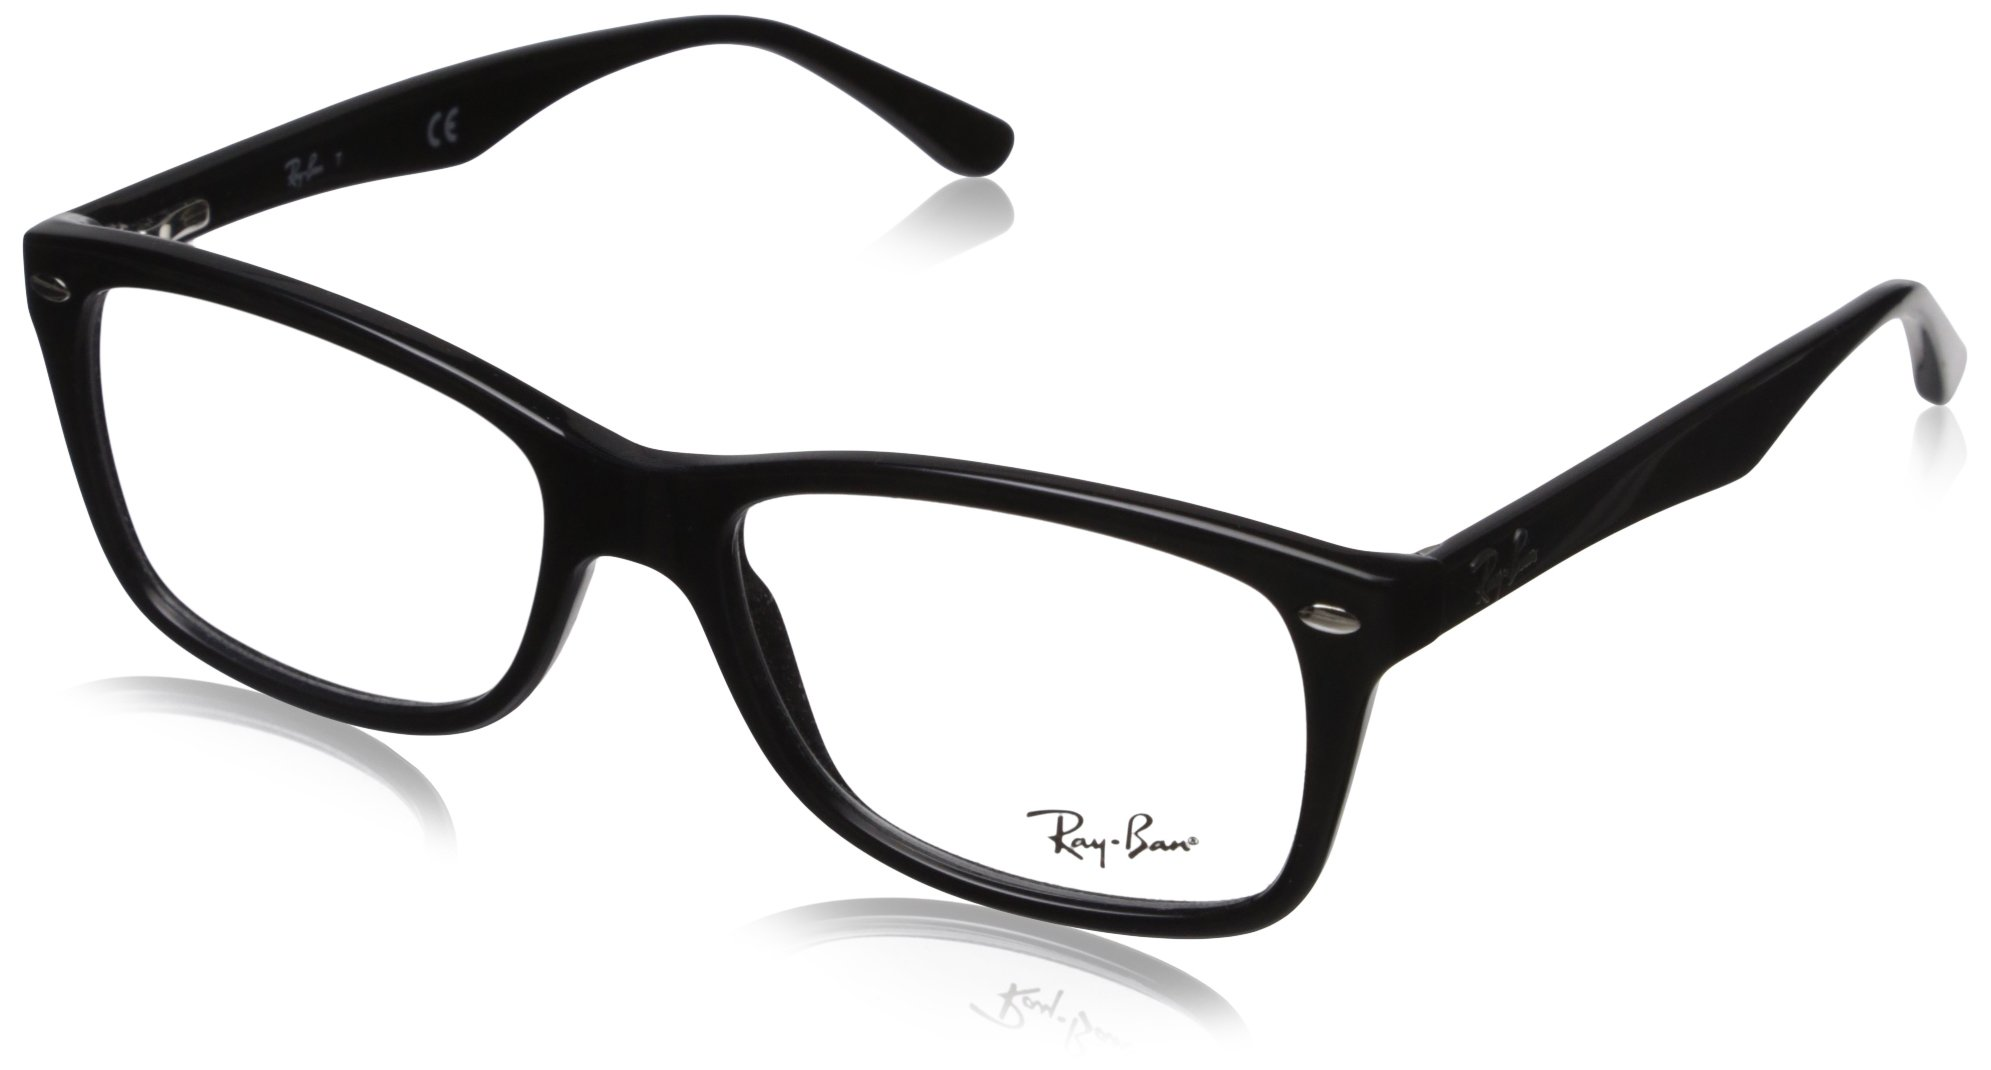 Ray-Ban Women's RX5228 Eyeglasses Shiny Black 53mm by Ray-Ban